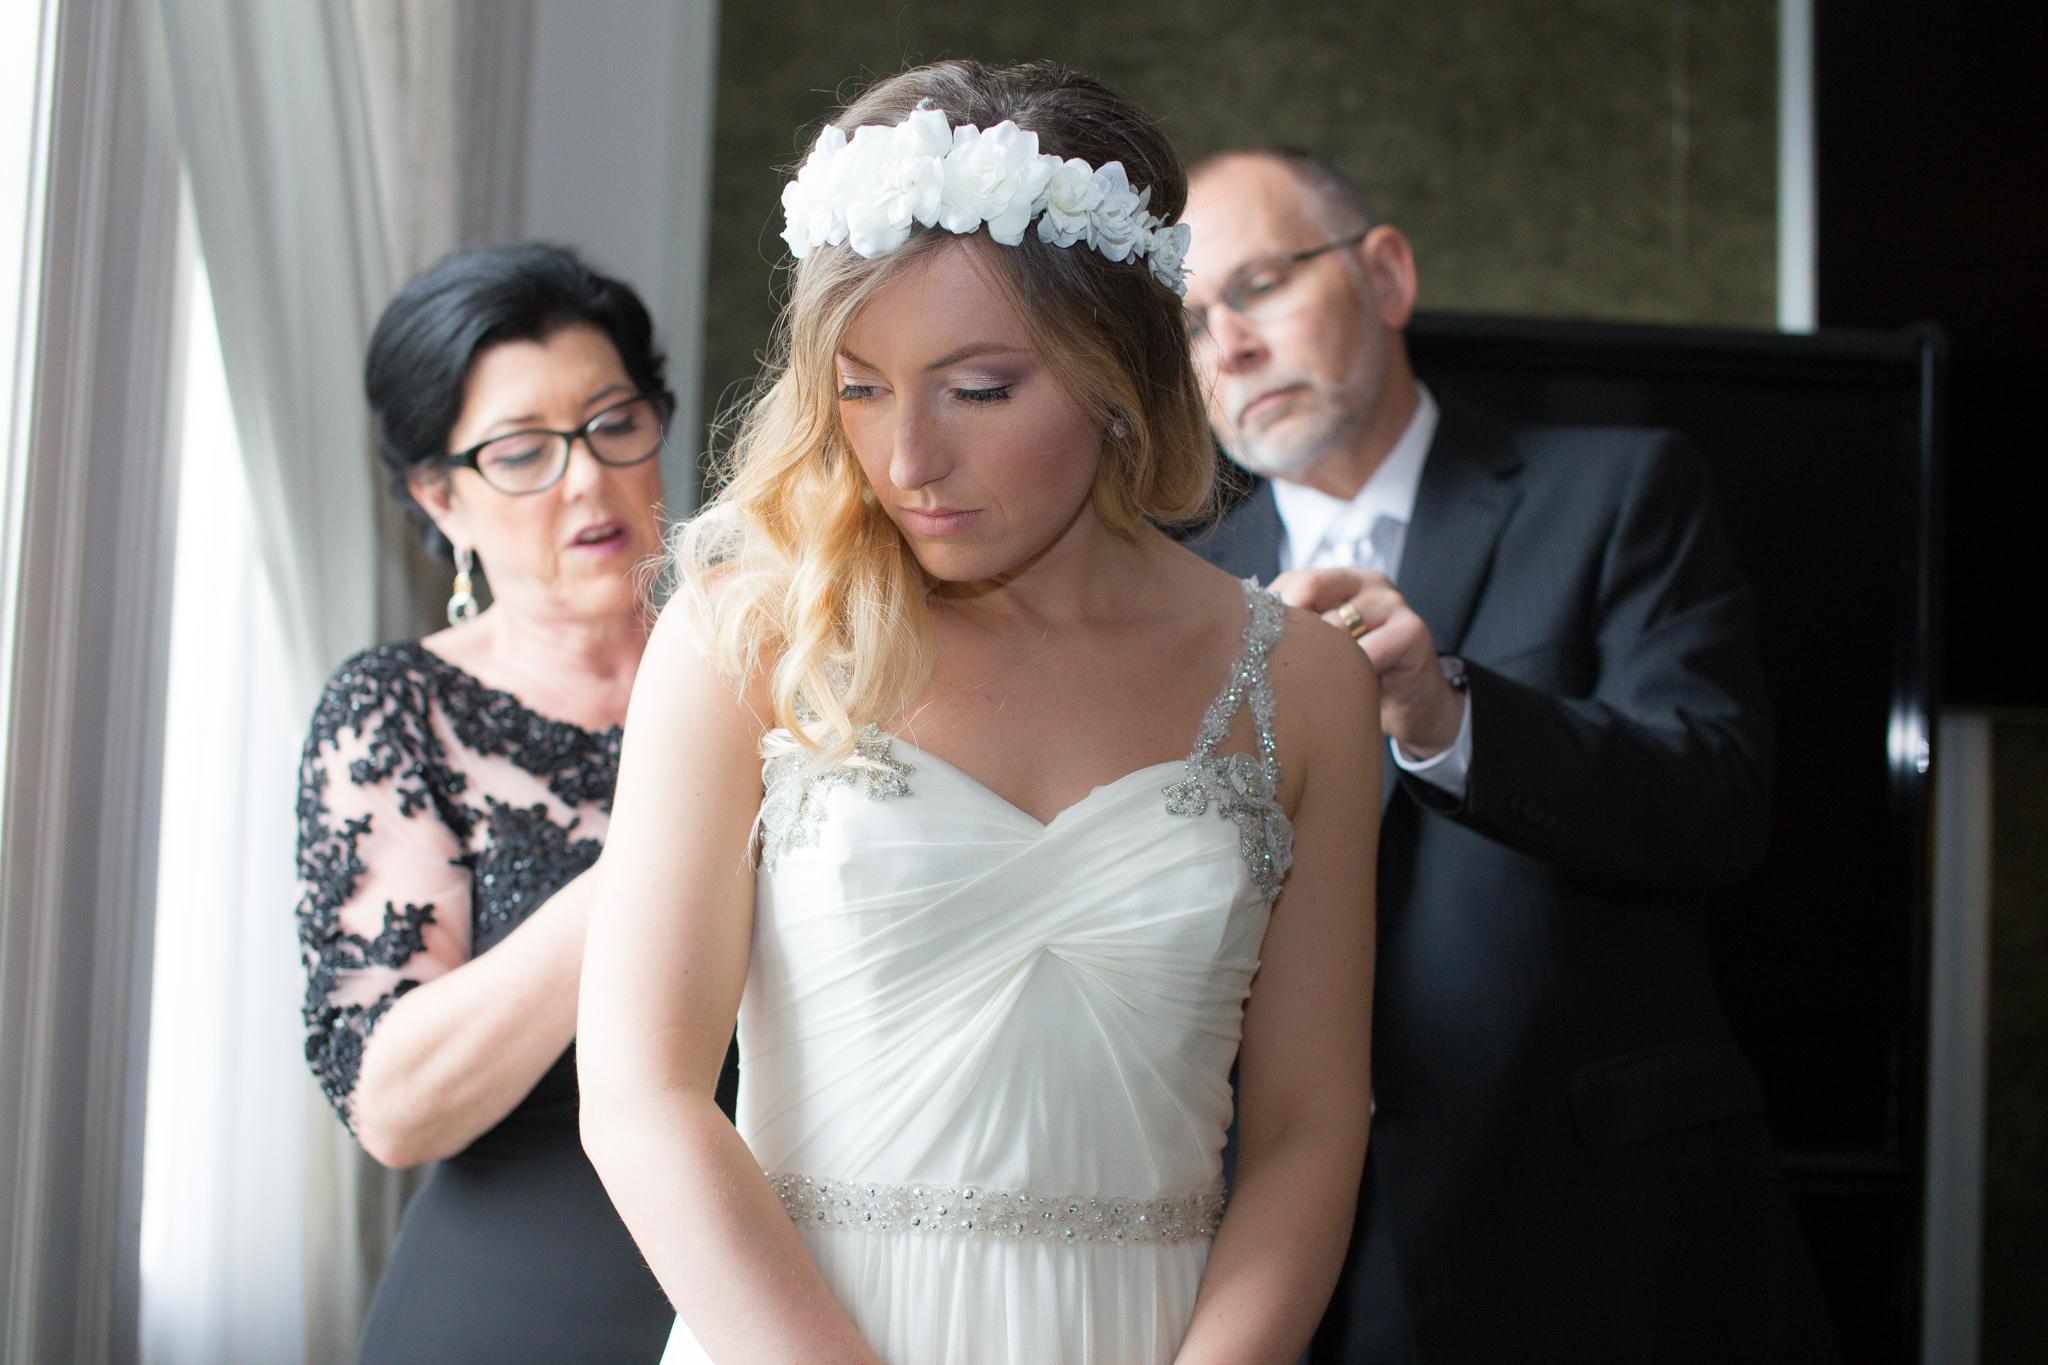 Toronto Wedding Photographer - 36 - 7209.jpg